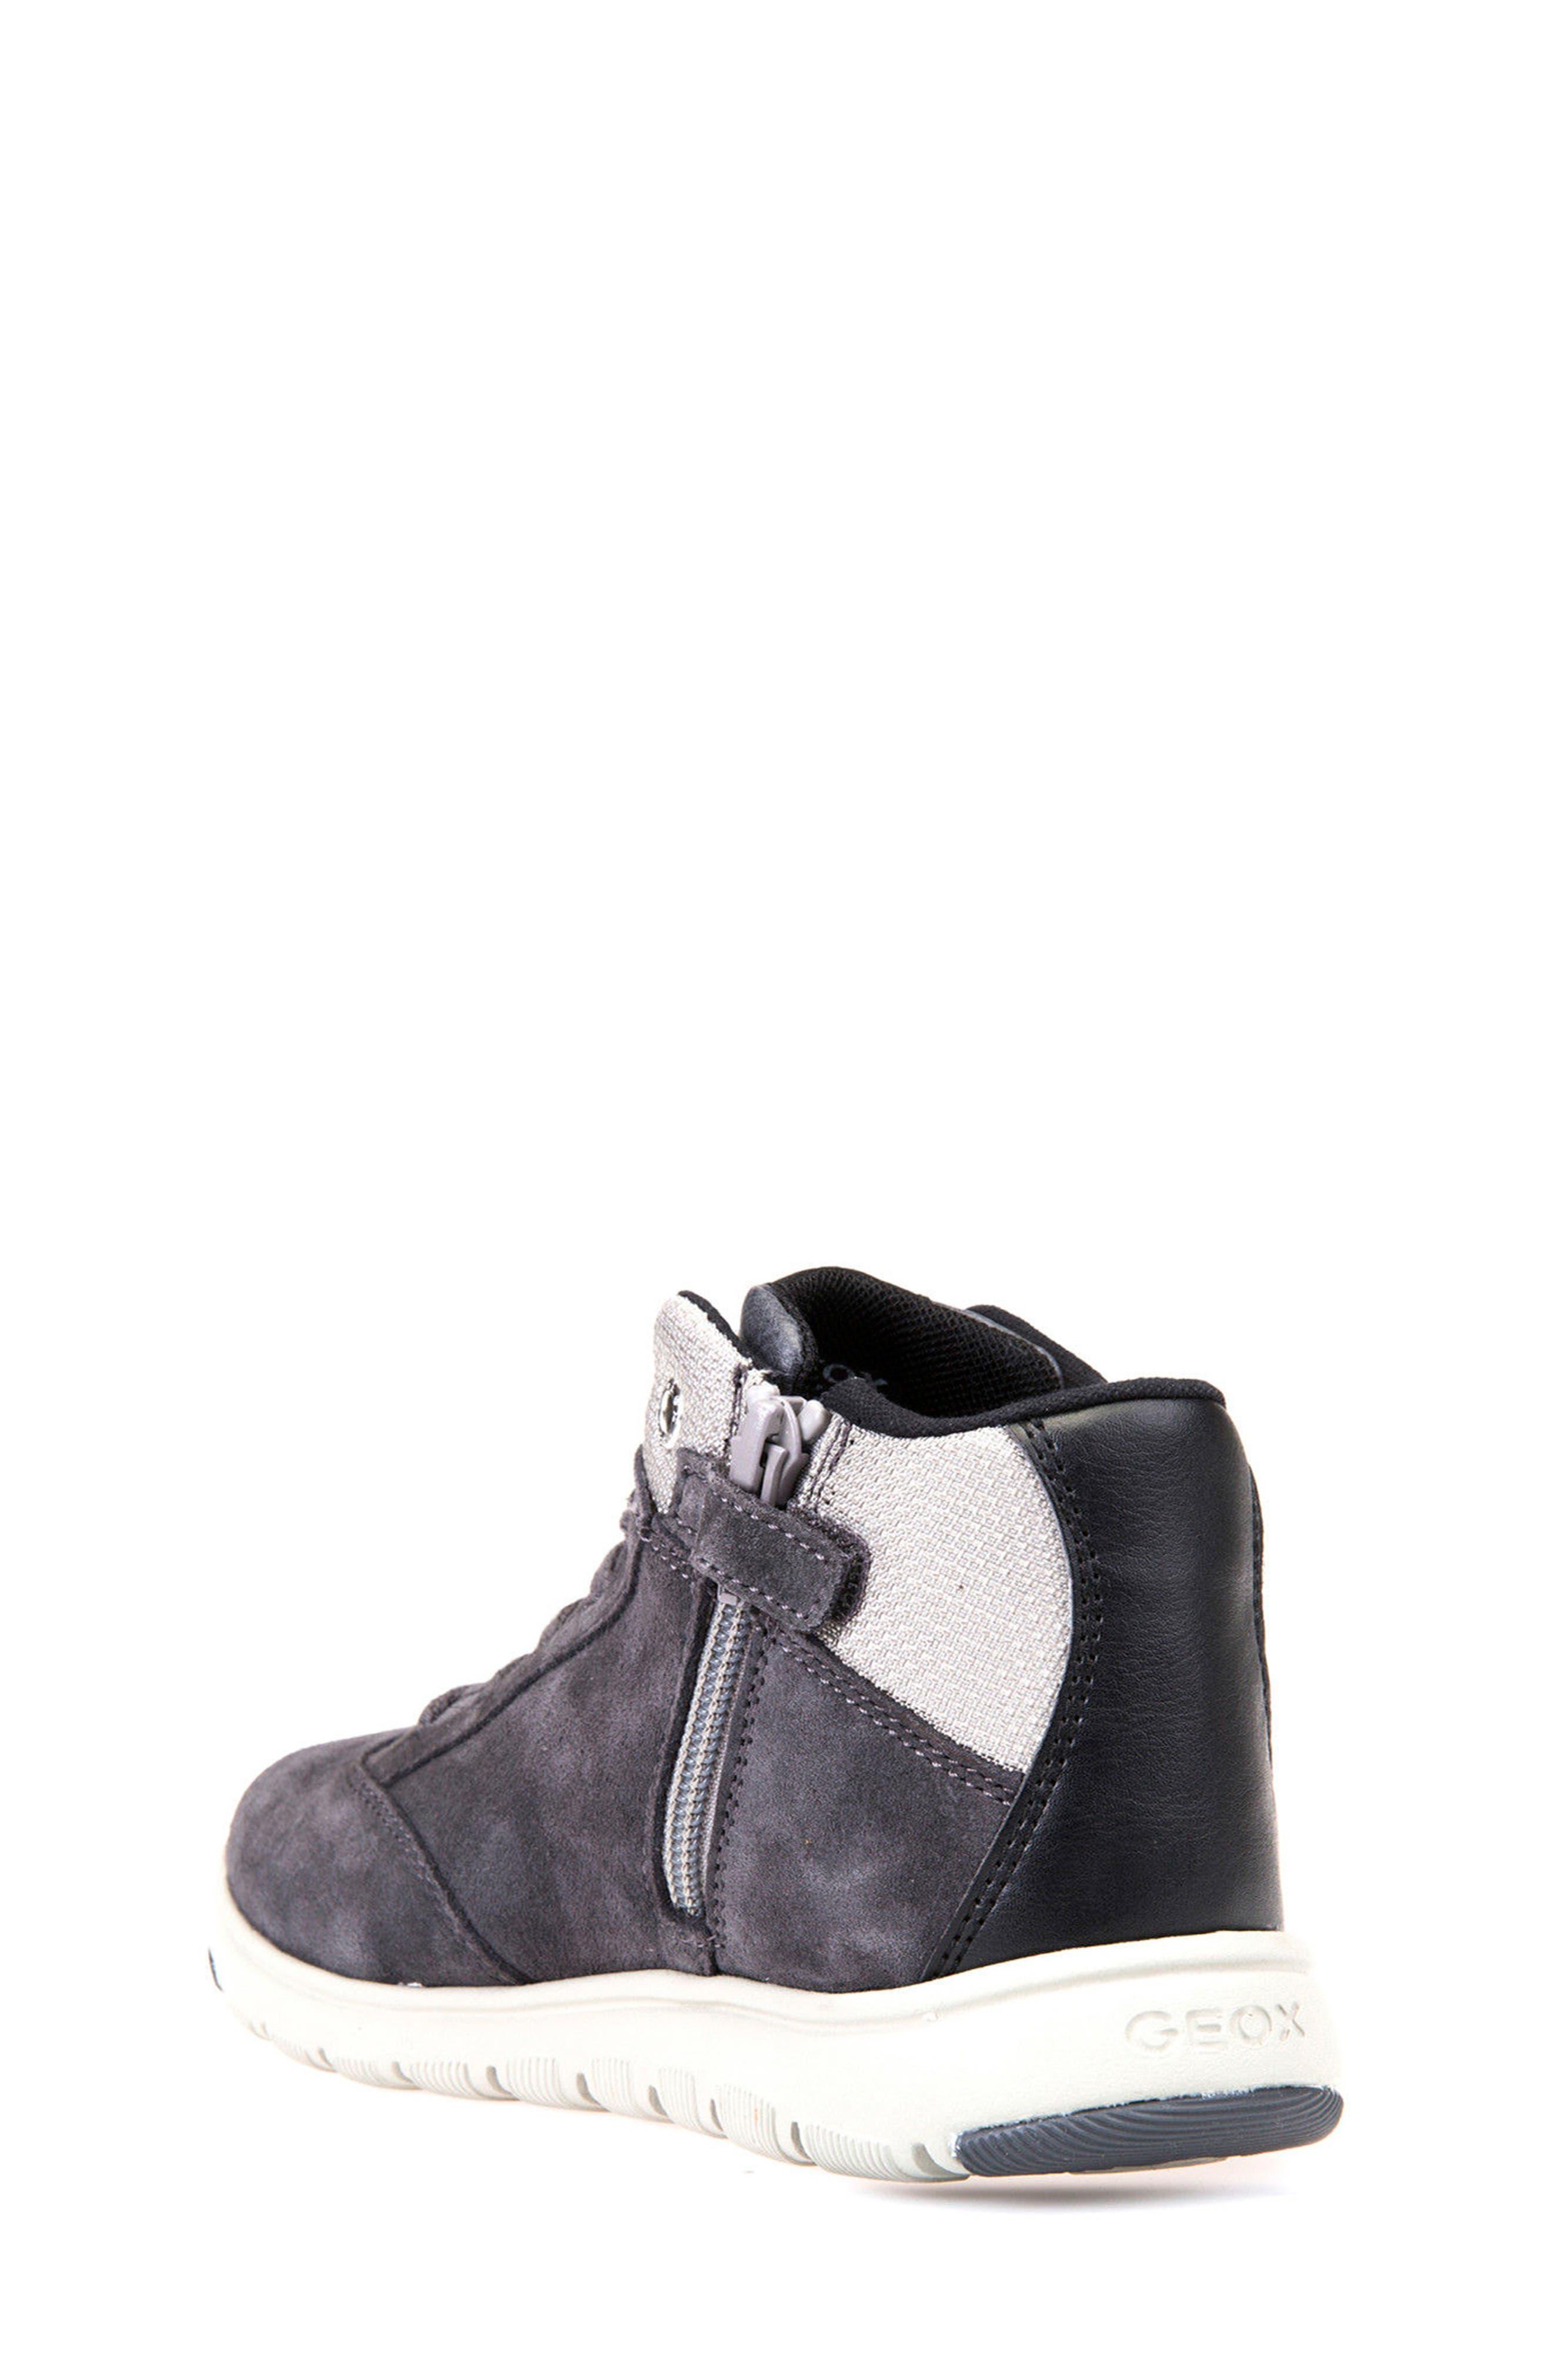 Xunday Mid Top Sneaker,                             Alternate thumbnail 2, color,                             Grey/ Light Grey